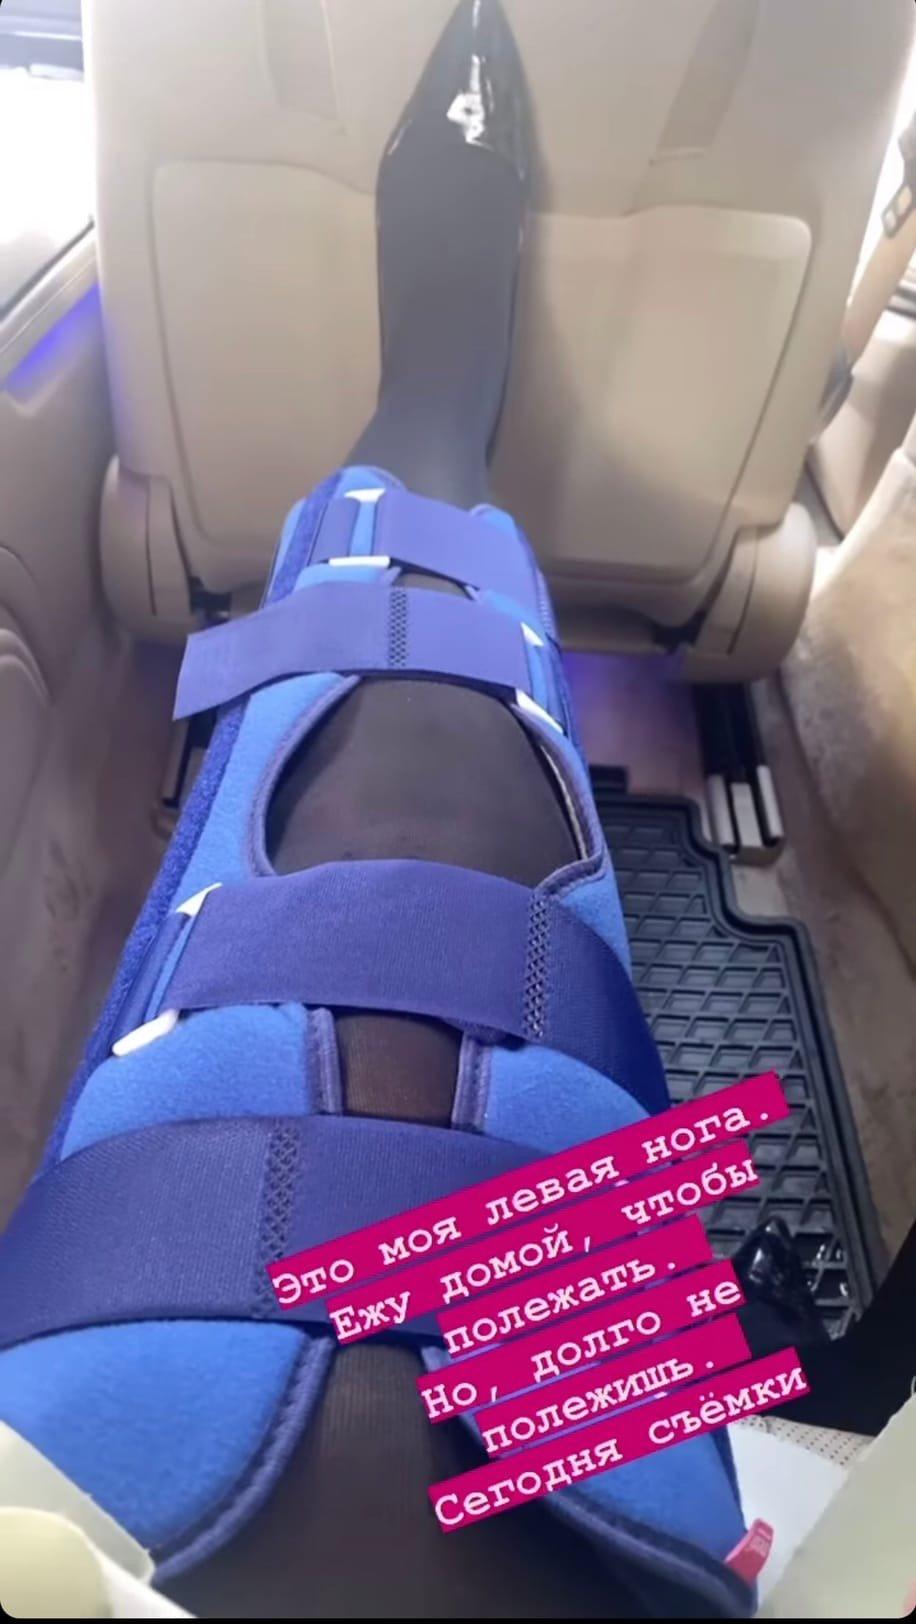 Елена Малышева травмировала ногу